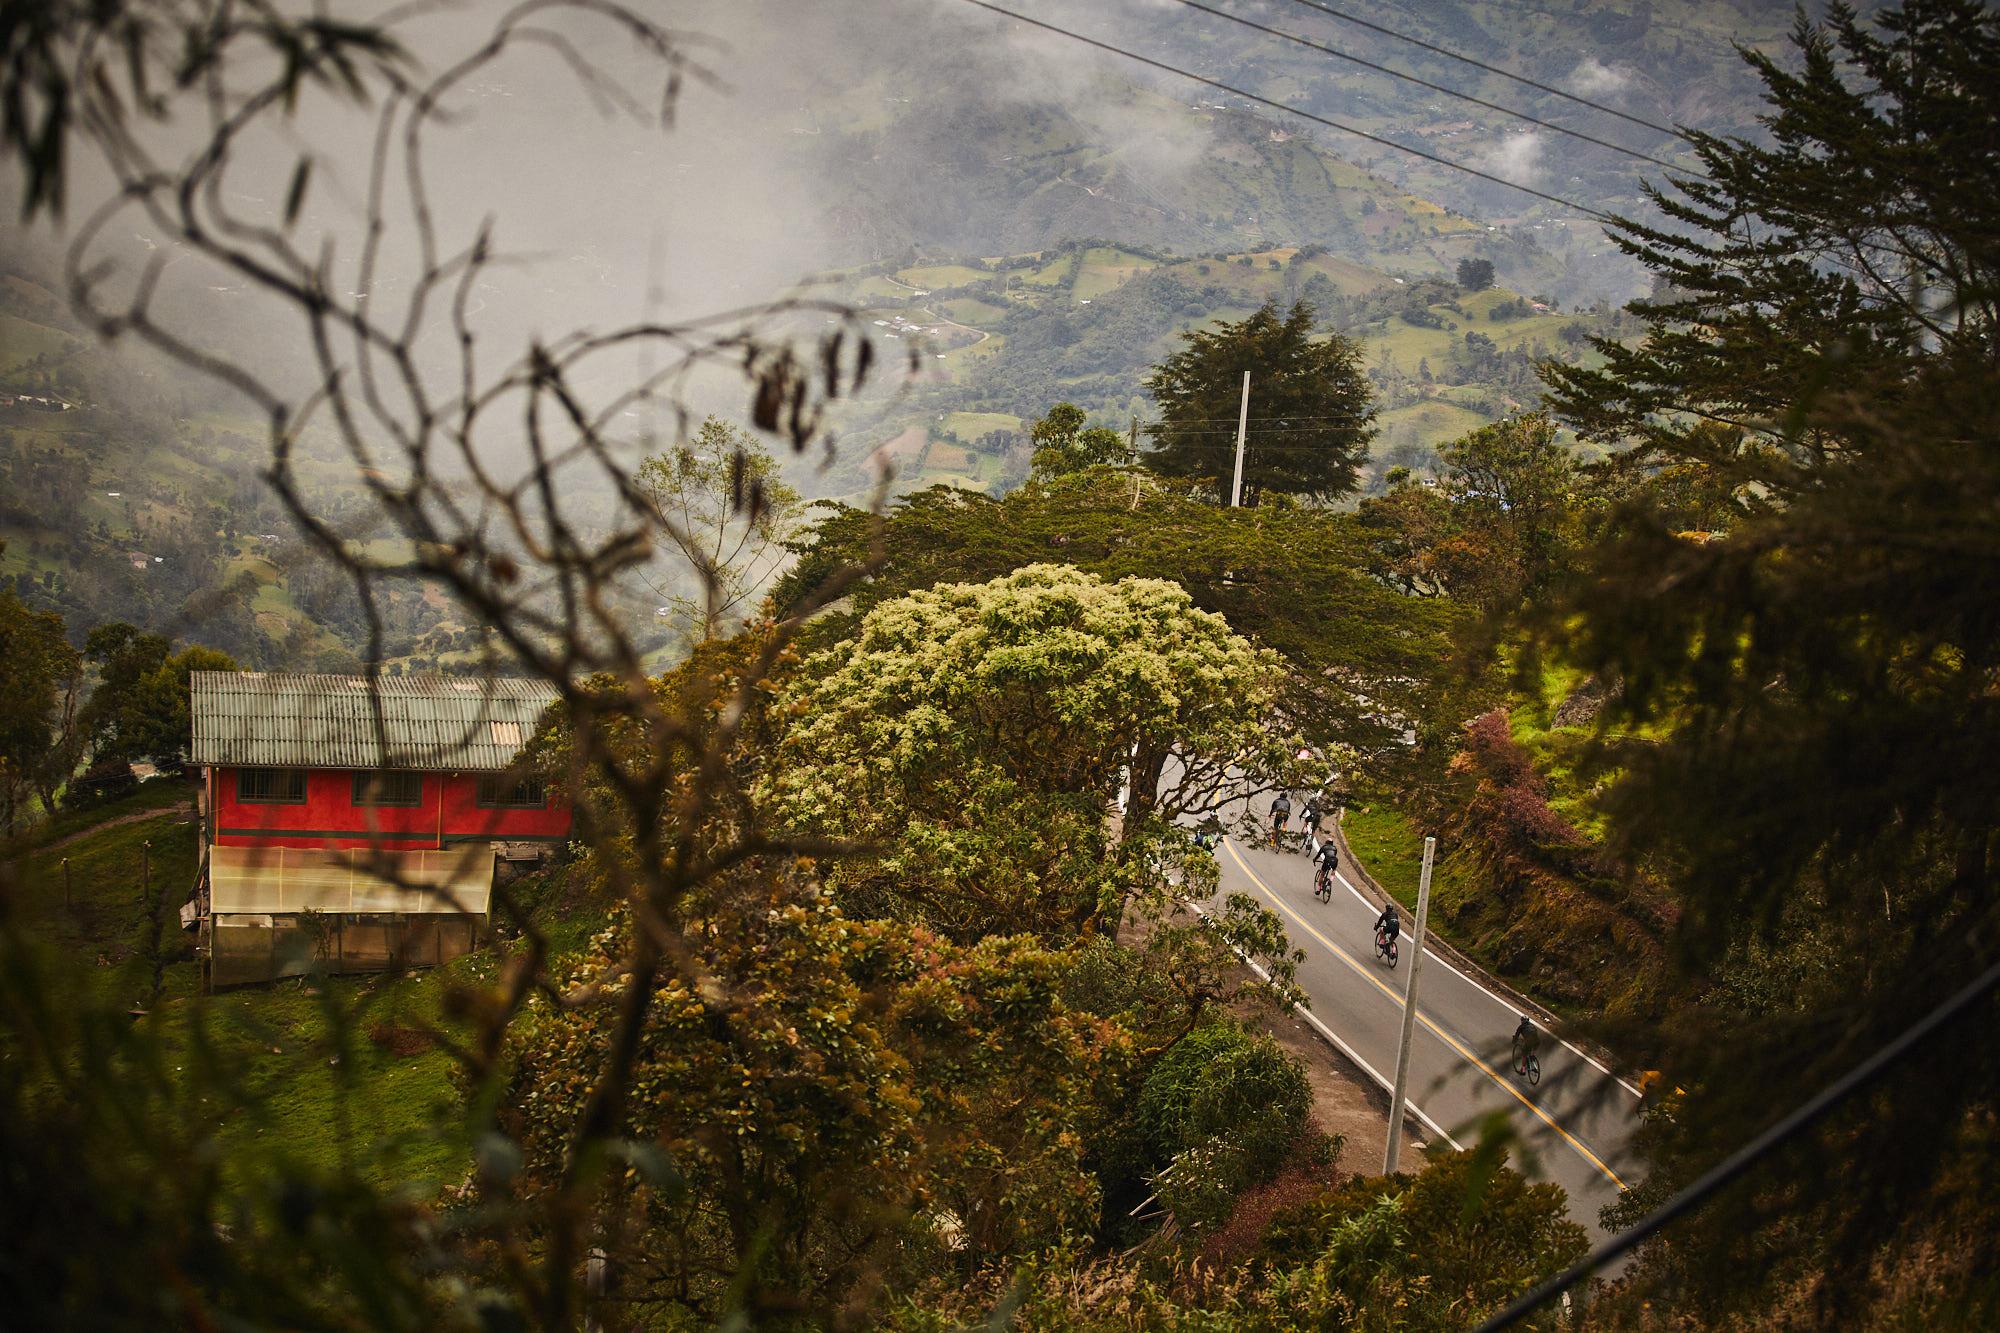 LOWRES-RADRACE-COLUMBIA-2018-CARLOS-0281.jpg